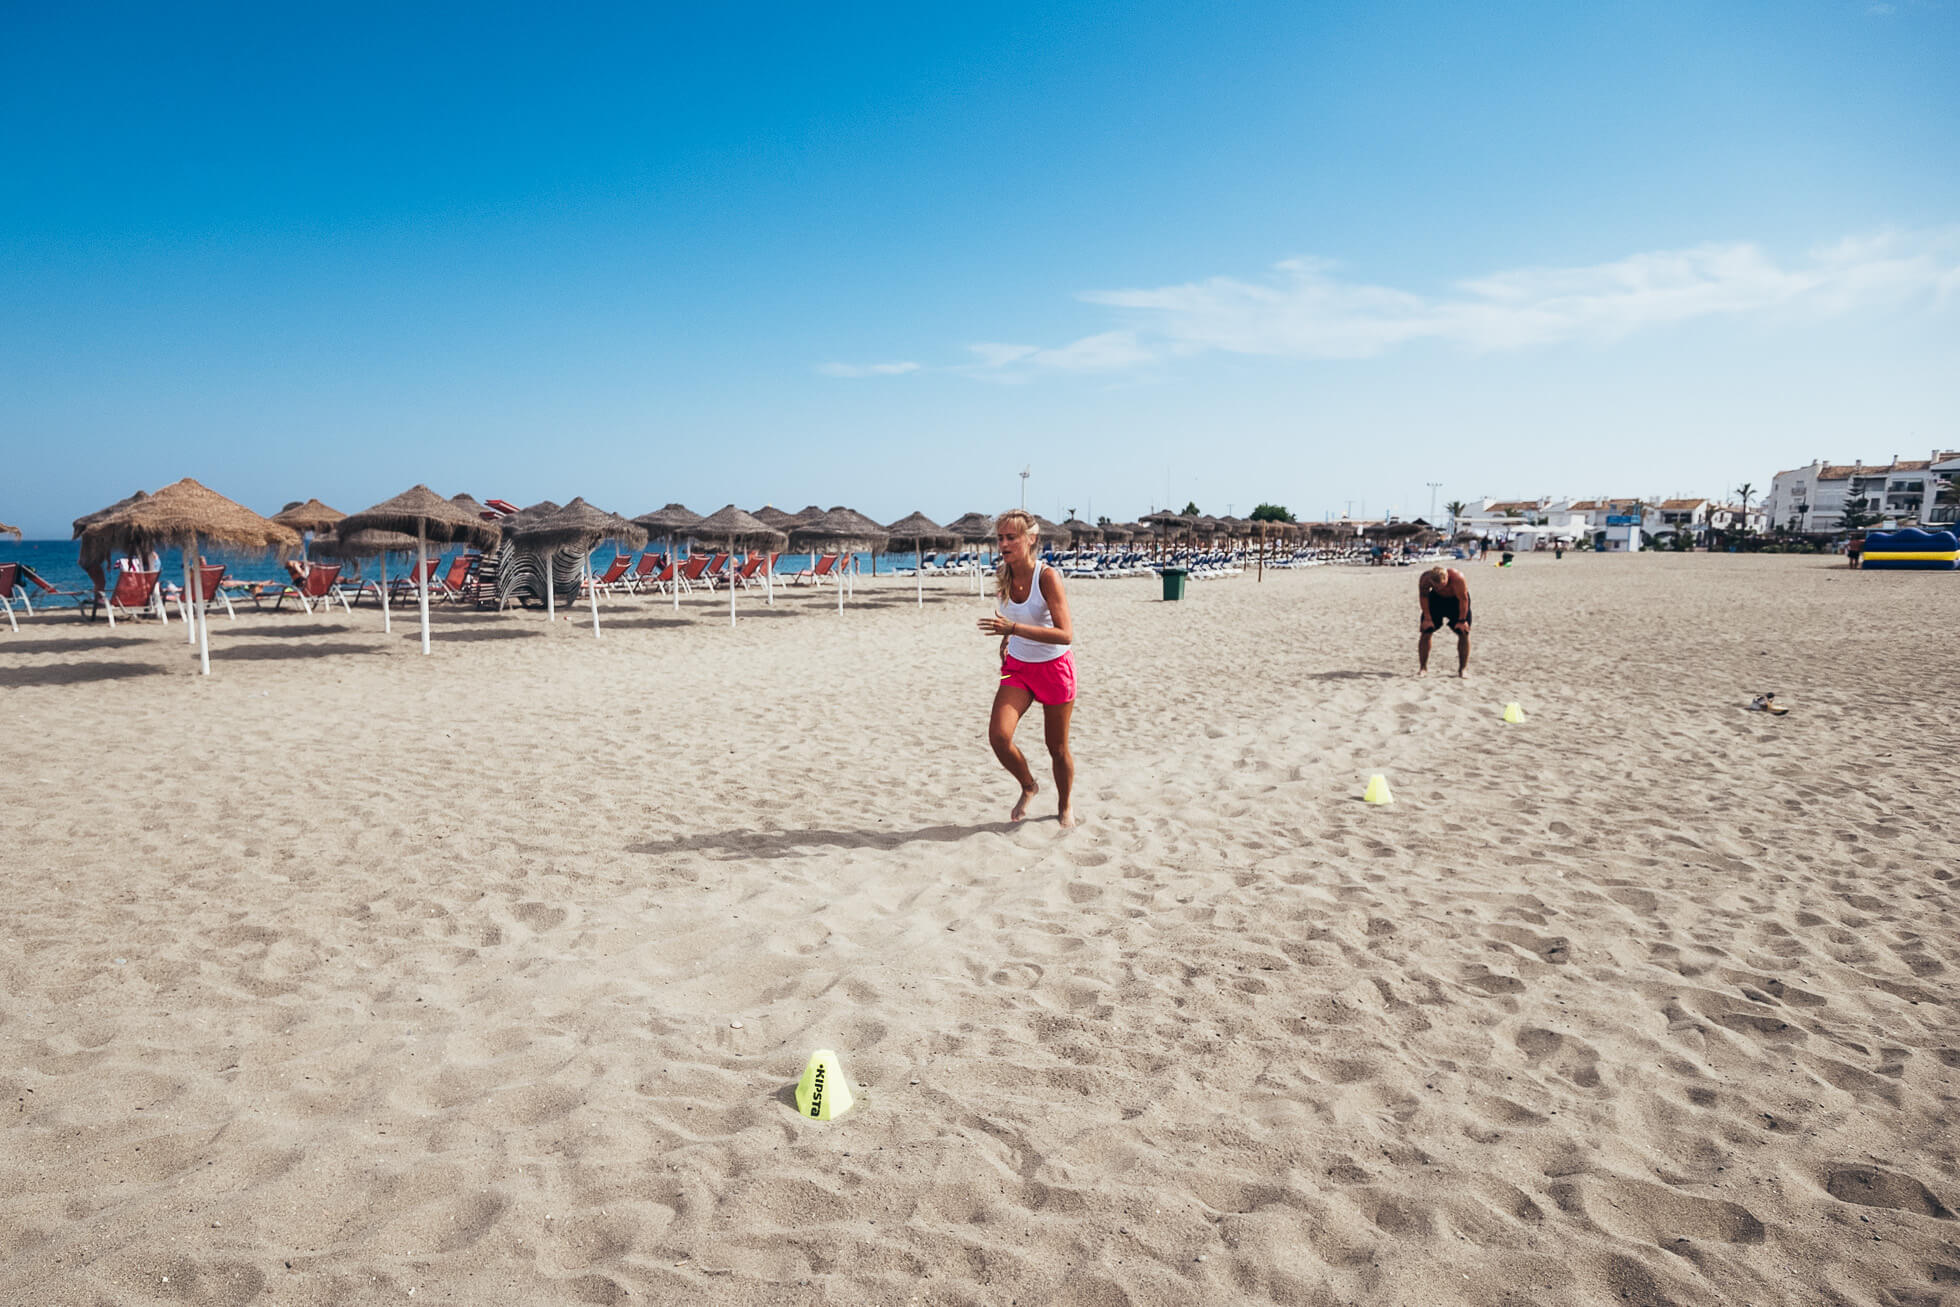 janni-deler-beach-workoutJ1120634